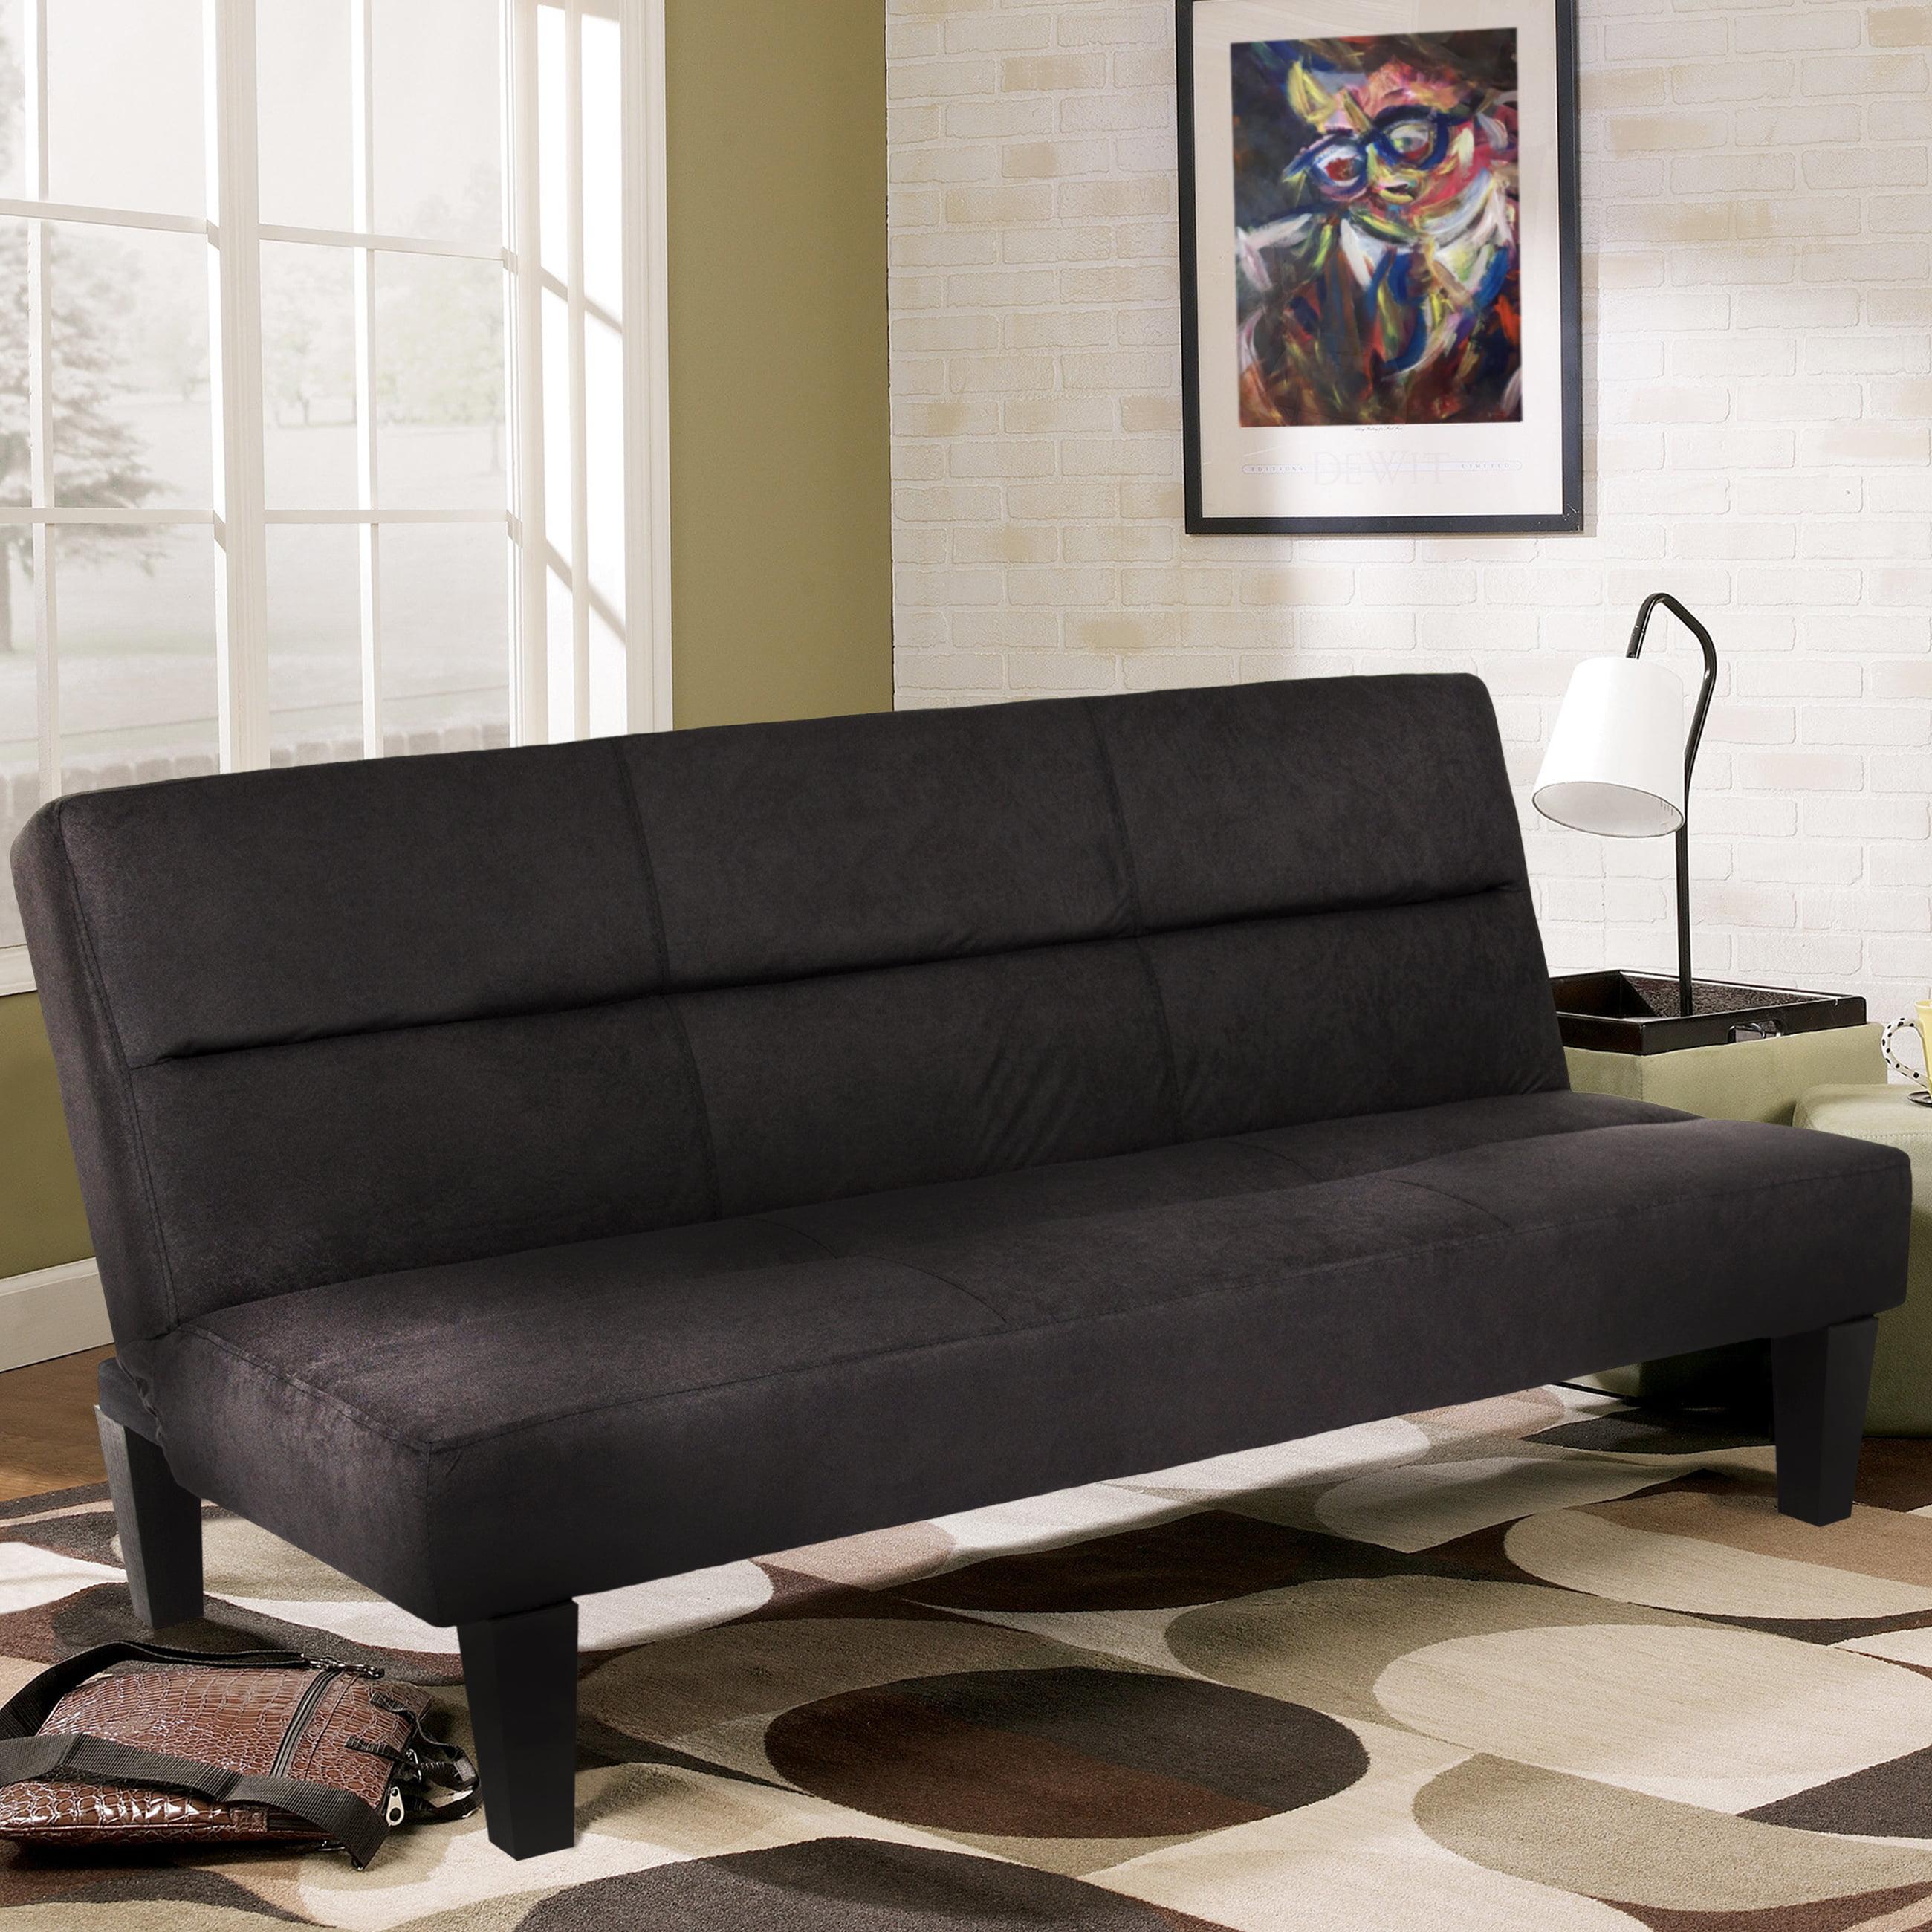 best choice products microfiber futon folding couch sofa black walmartcom